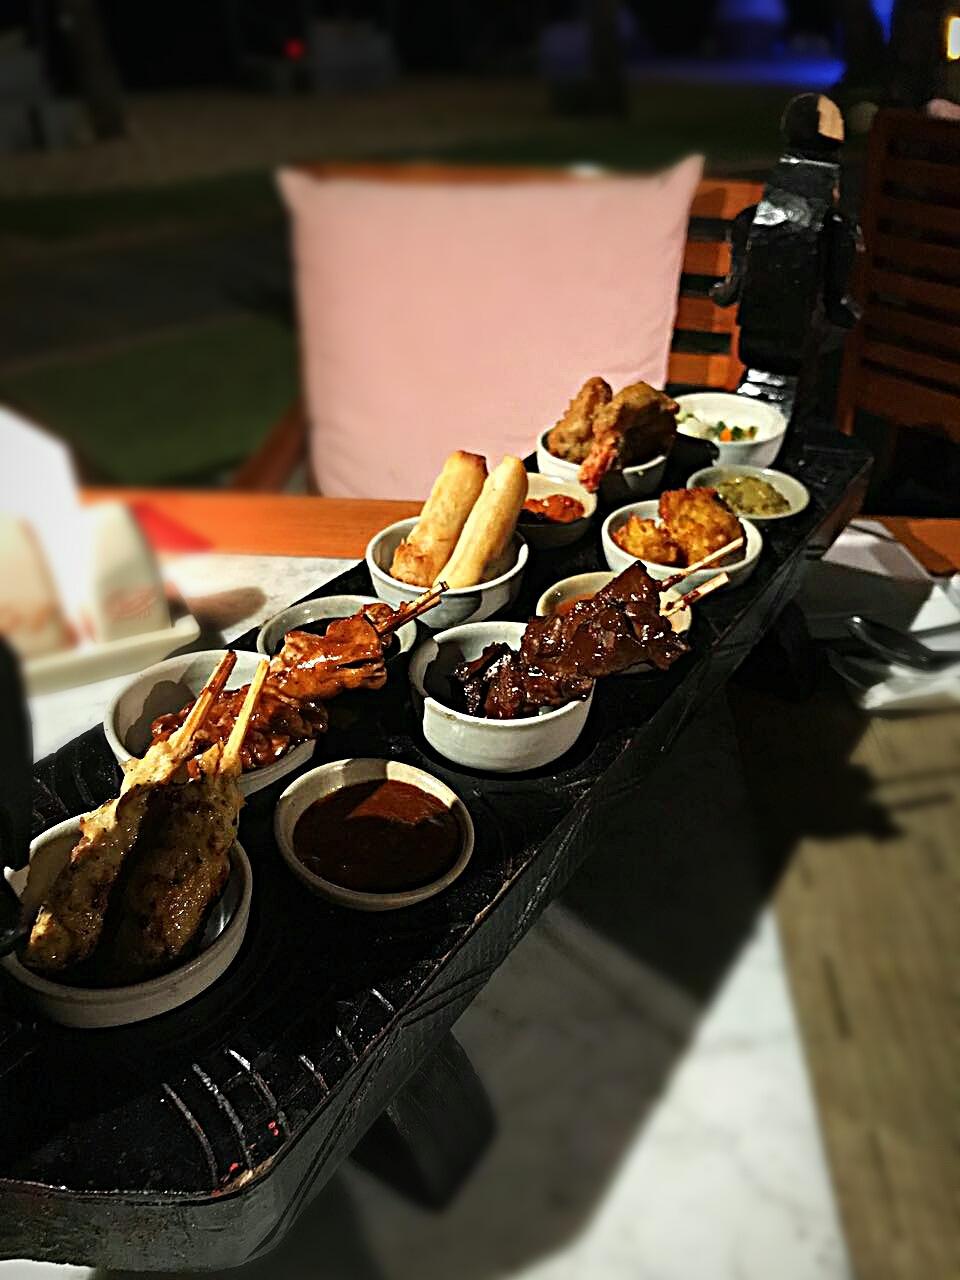 indonesian food by Vita Dewi Aprilia